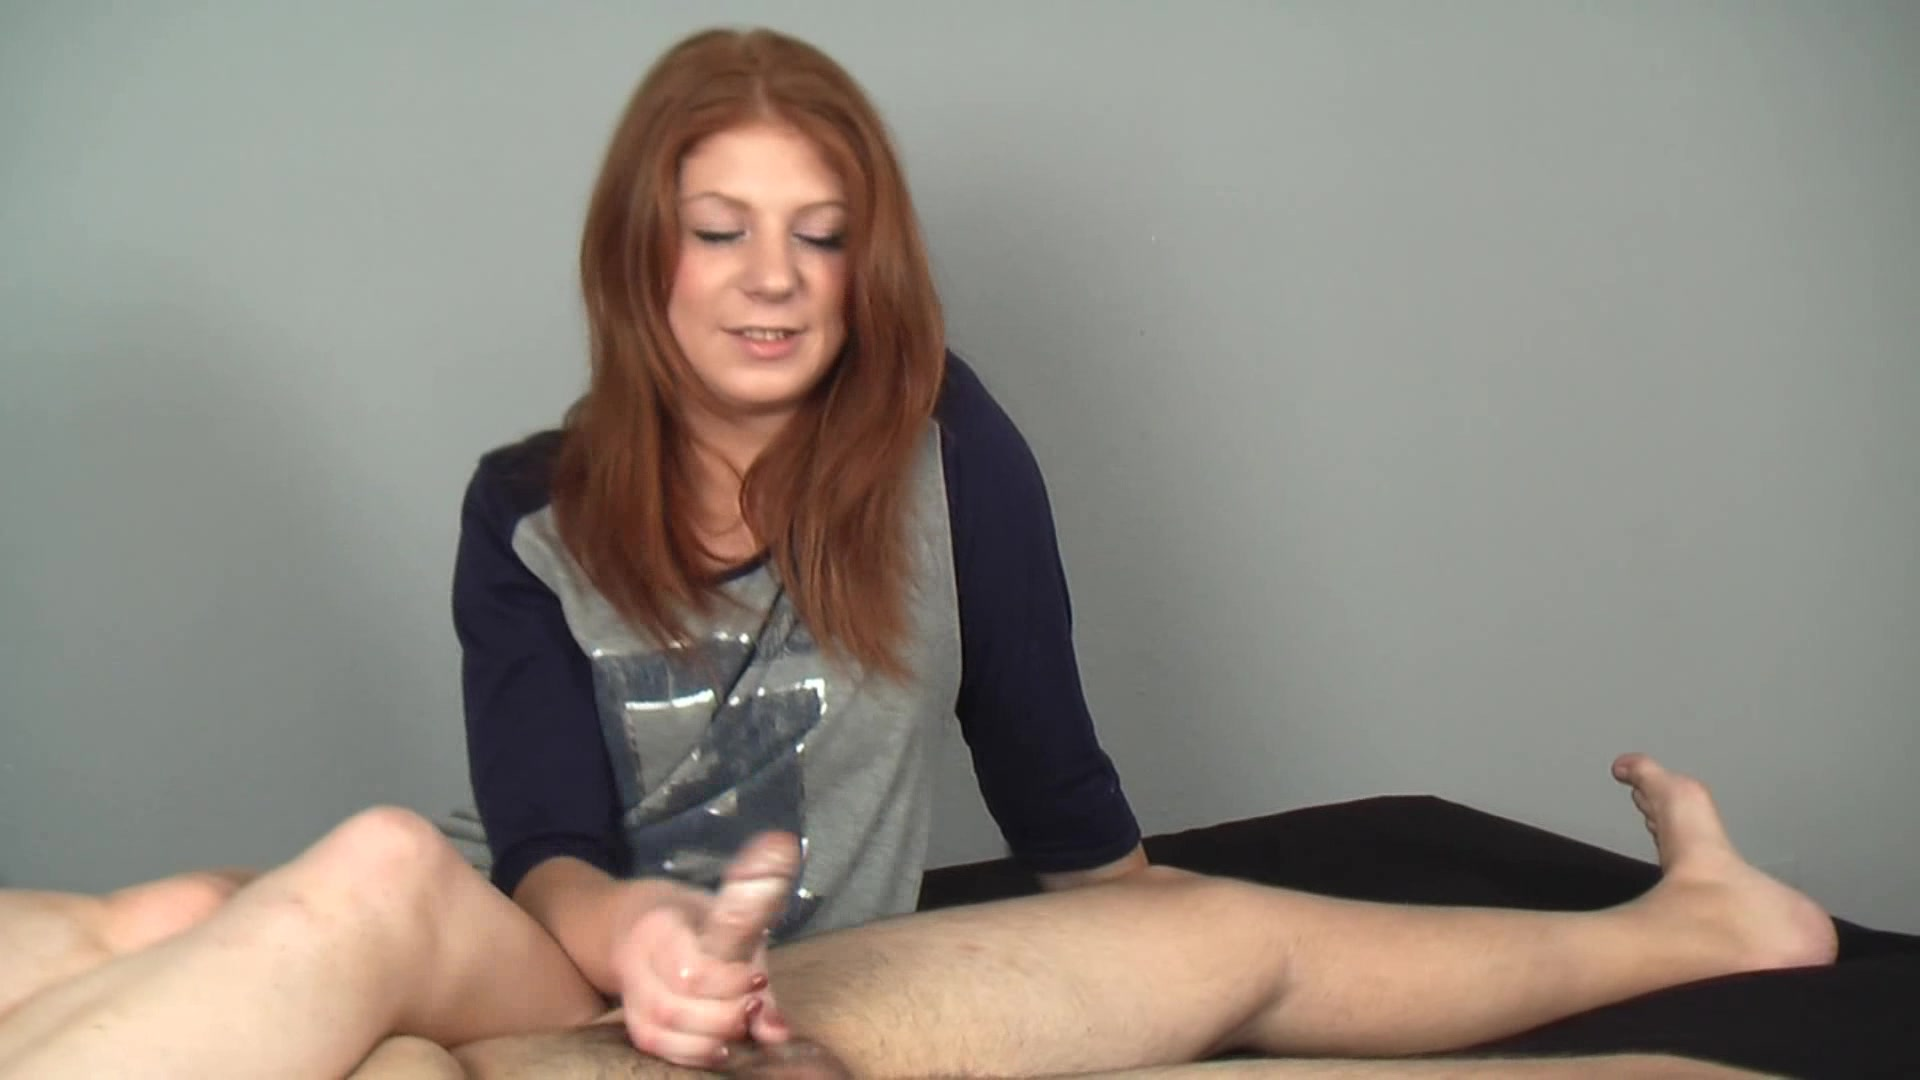 porn-videos-premature-ejaculation-porn